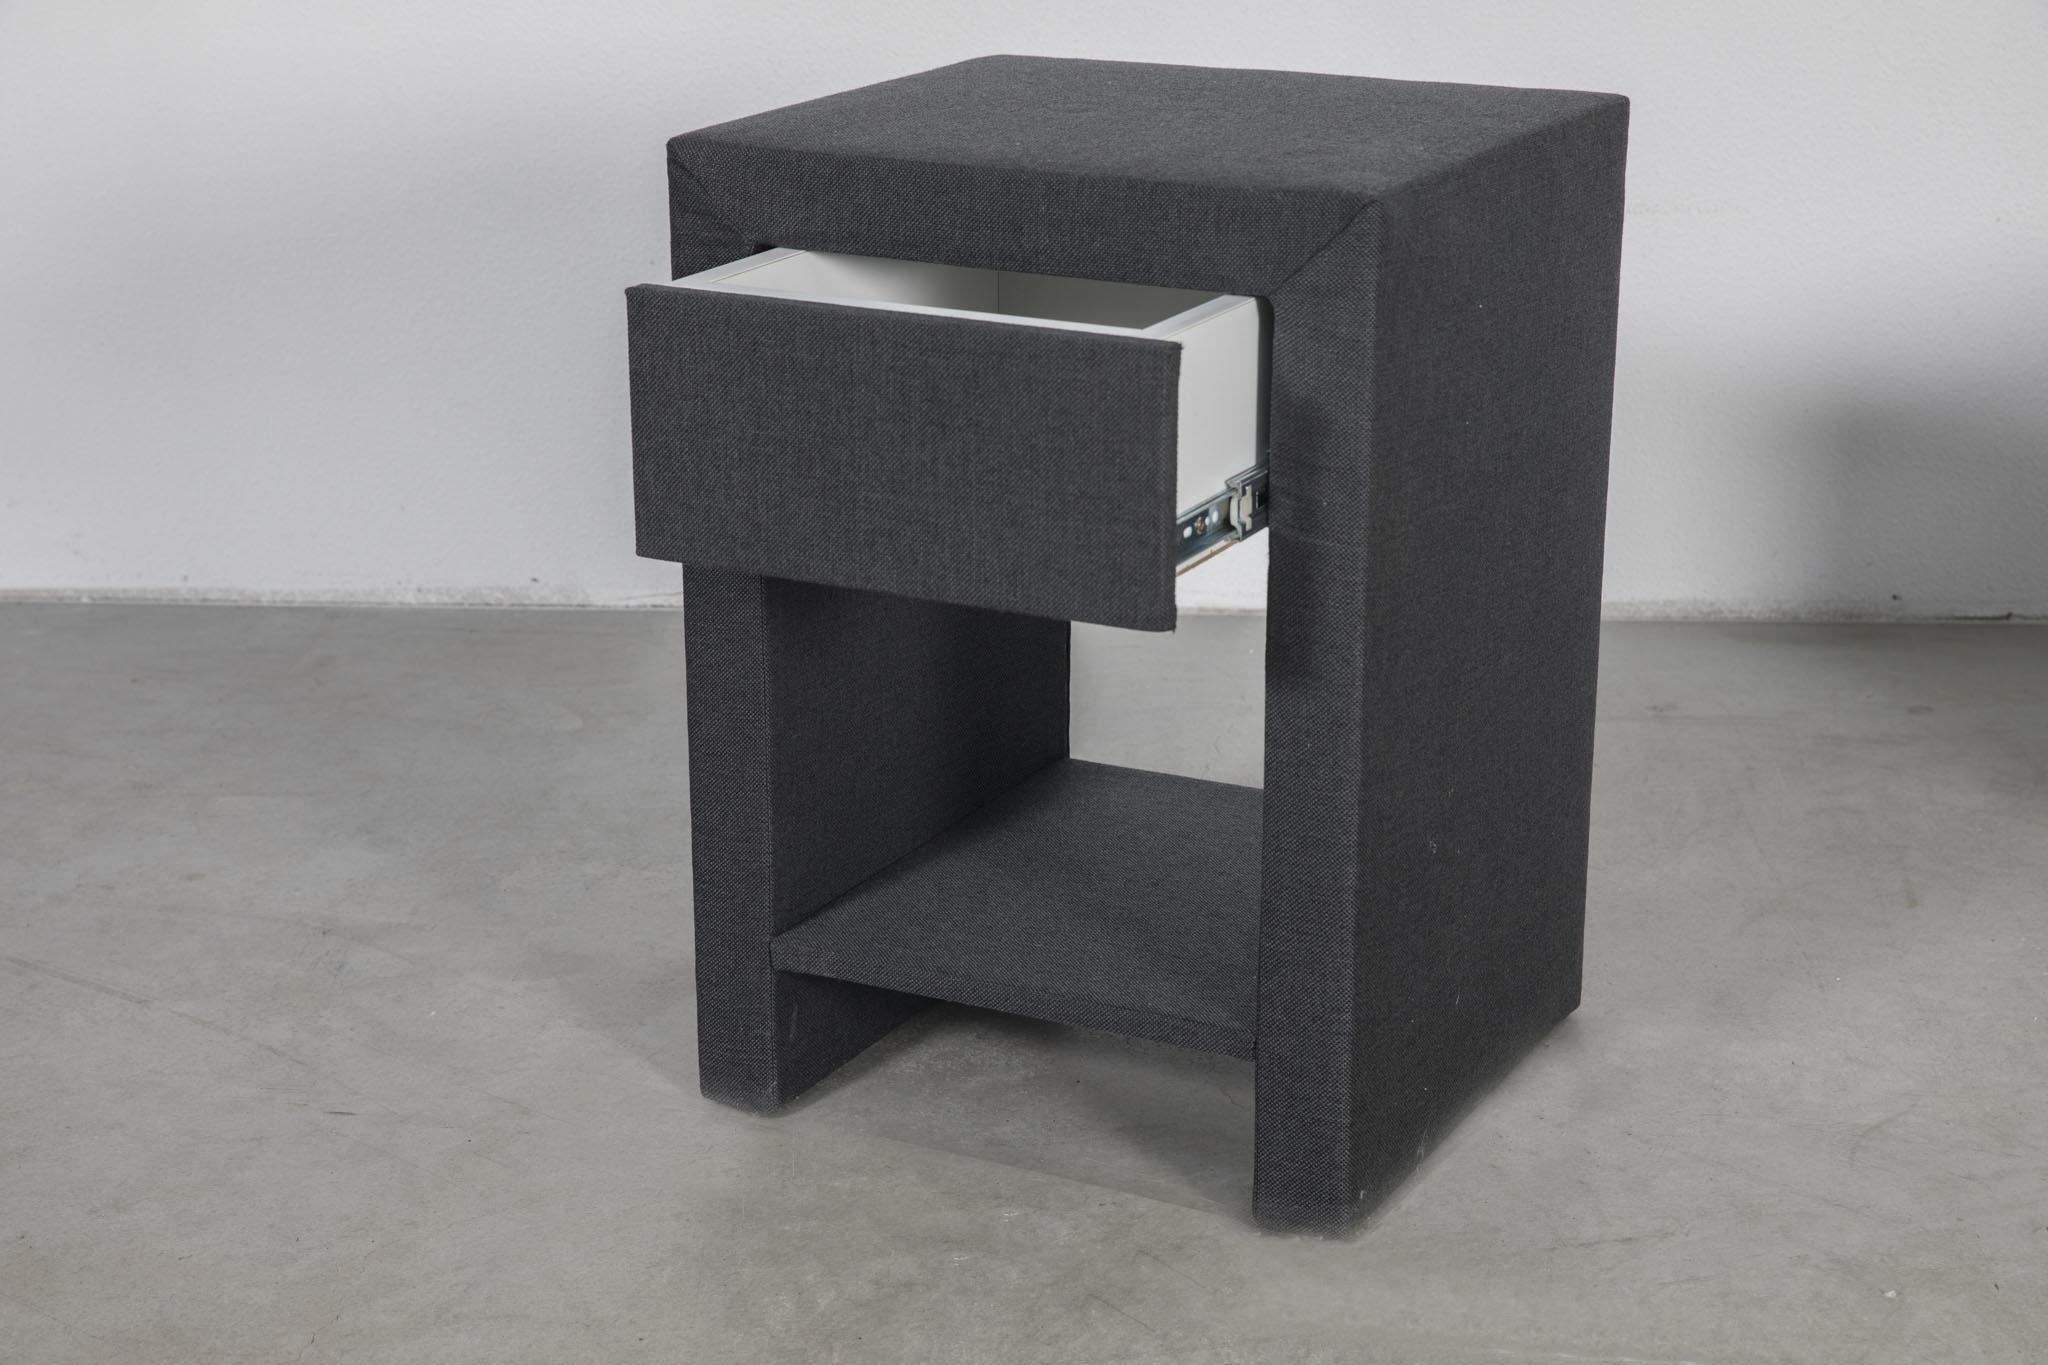 Boxspring Black Friday Delux met Prachtige 30 cm Hoge Boxen !